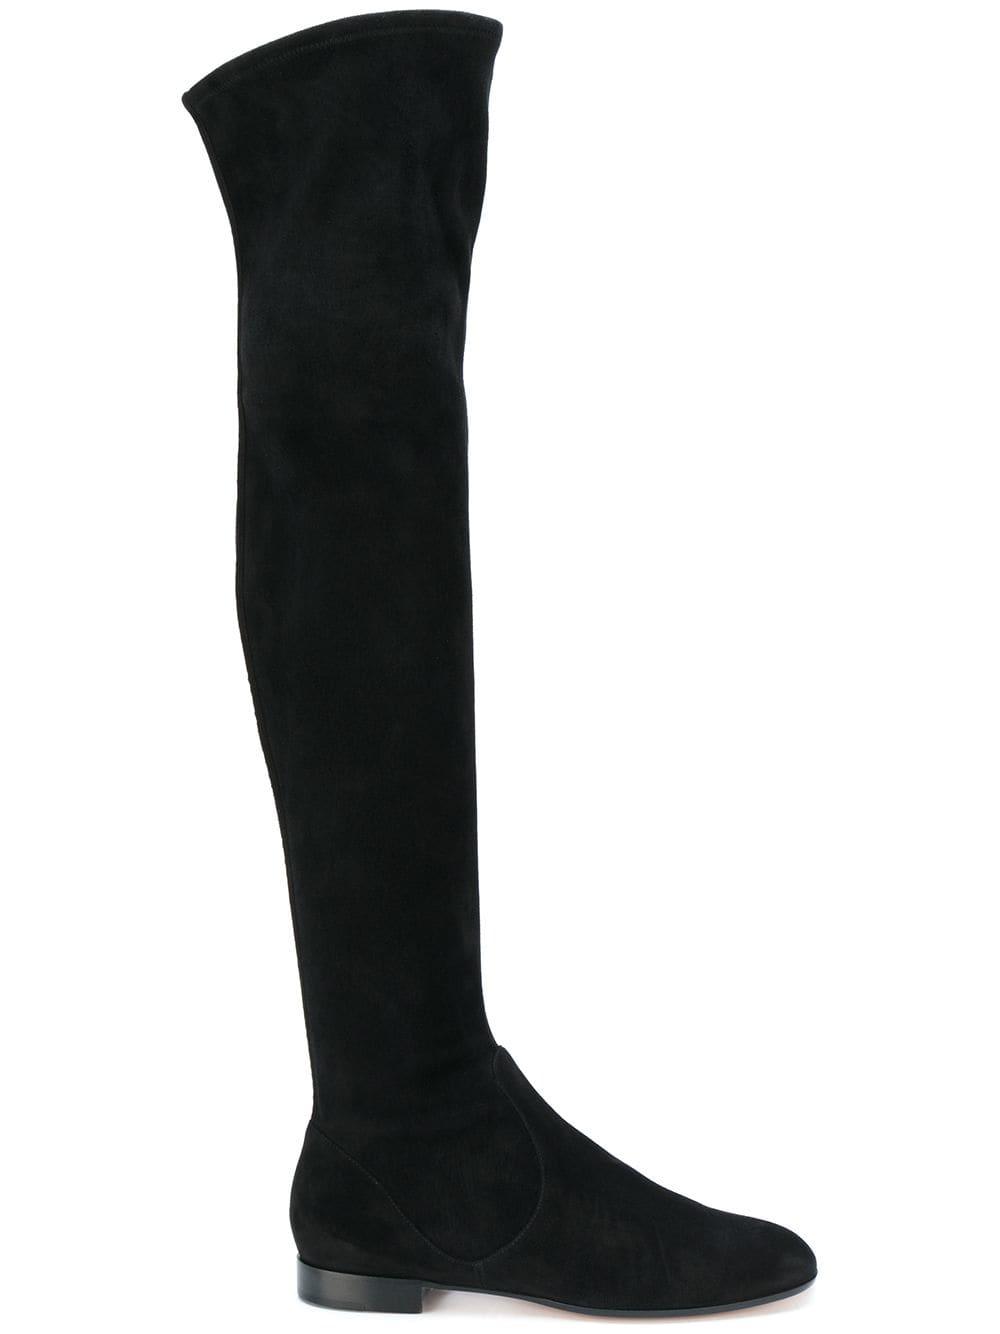 Gianvito Rossi Overknee-Stiefel mit runder Kappe - Schwarz